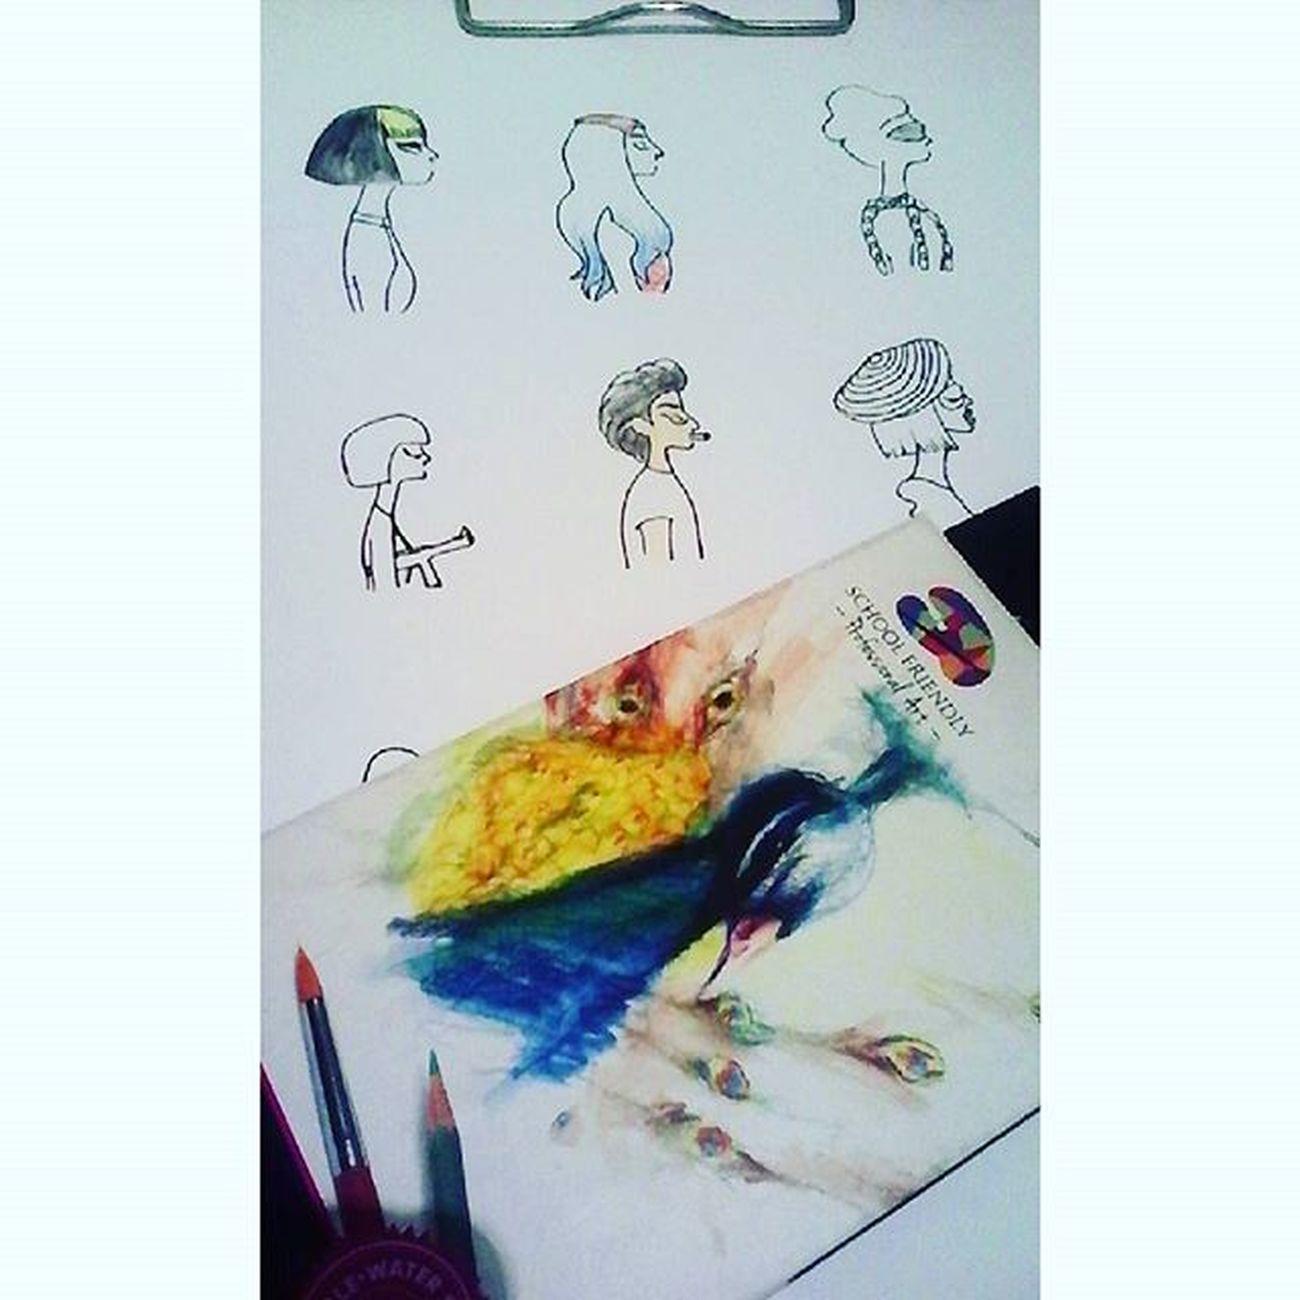 Gaga 😊❤ Draw Drawing Art Ladygaga Gaga Mothermonster Littlemonster Monster Picture Pic Photo Sketching Sketch Instaart Artist L L4l F4F Ff Instaartist Bestoftheday Cute Love Lovely Inspiration bestofthedayinstagoodinstamoodinstadailypencilartsy